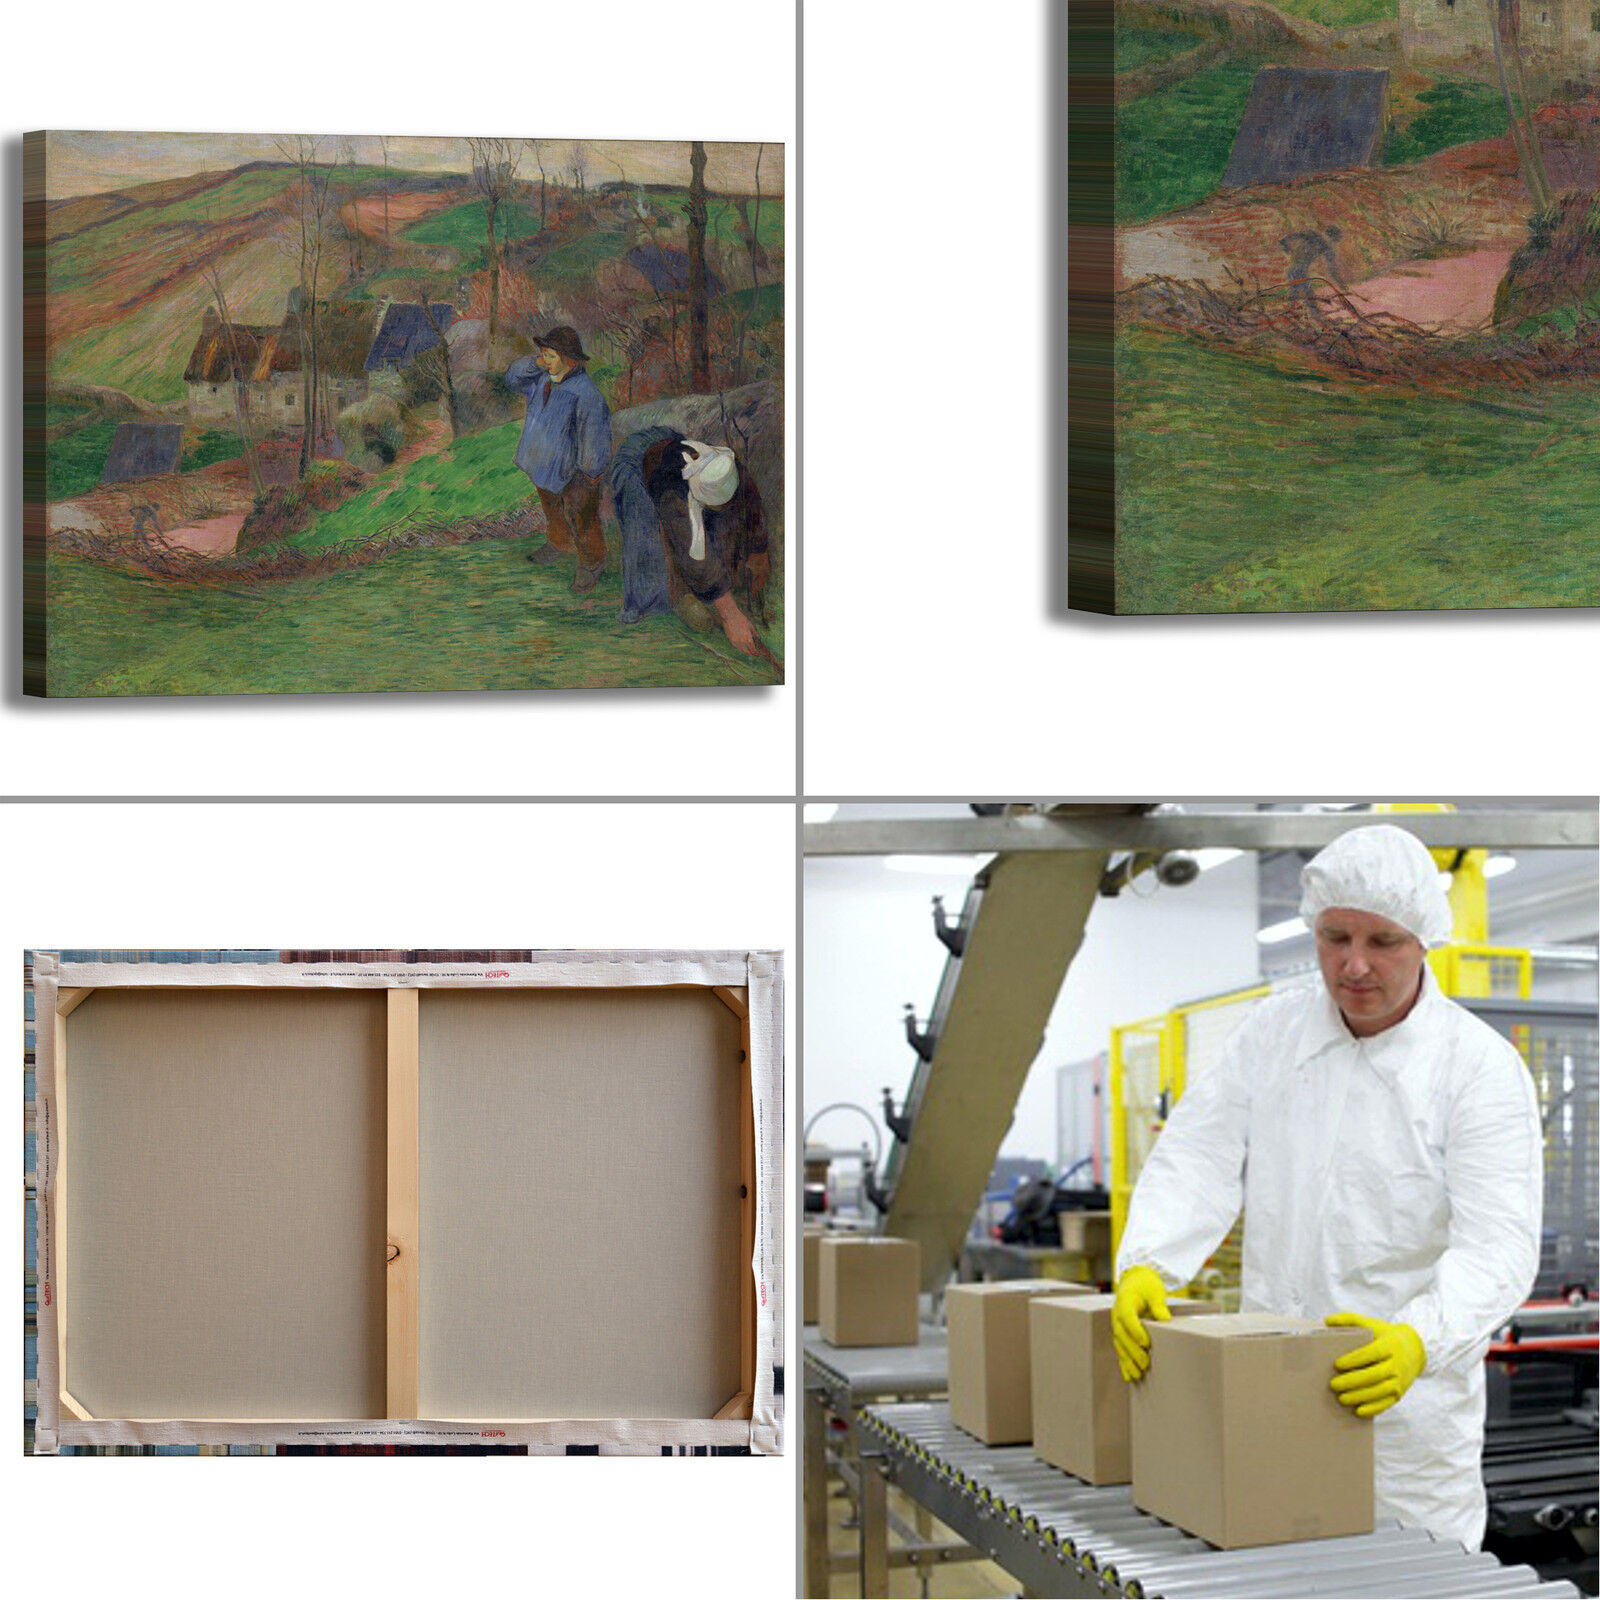 Gauguin paesaggio bretagna design quadro stampa tela dipinto telaio arroto arroto arroto casa 6ed7b5